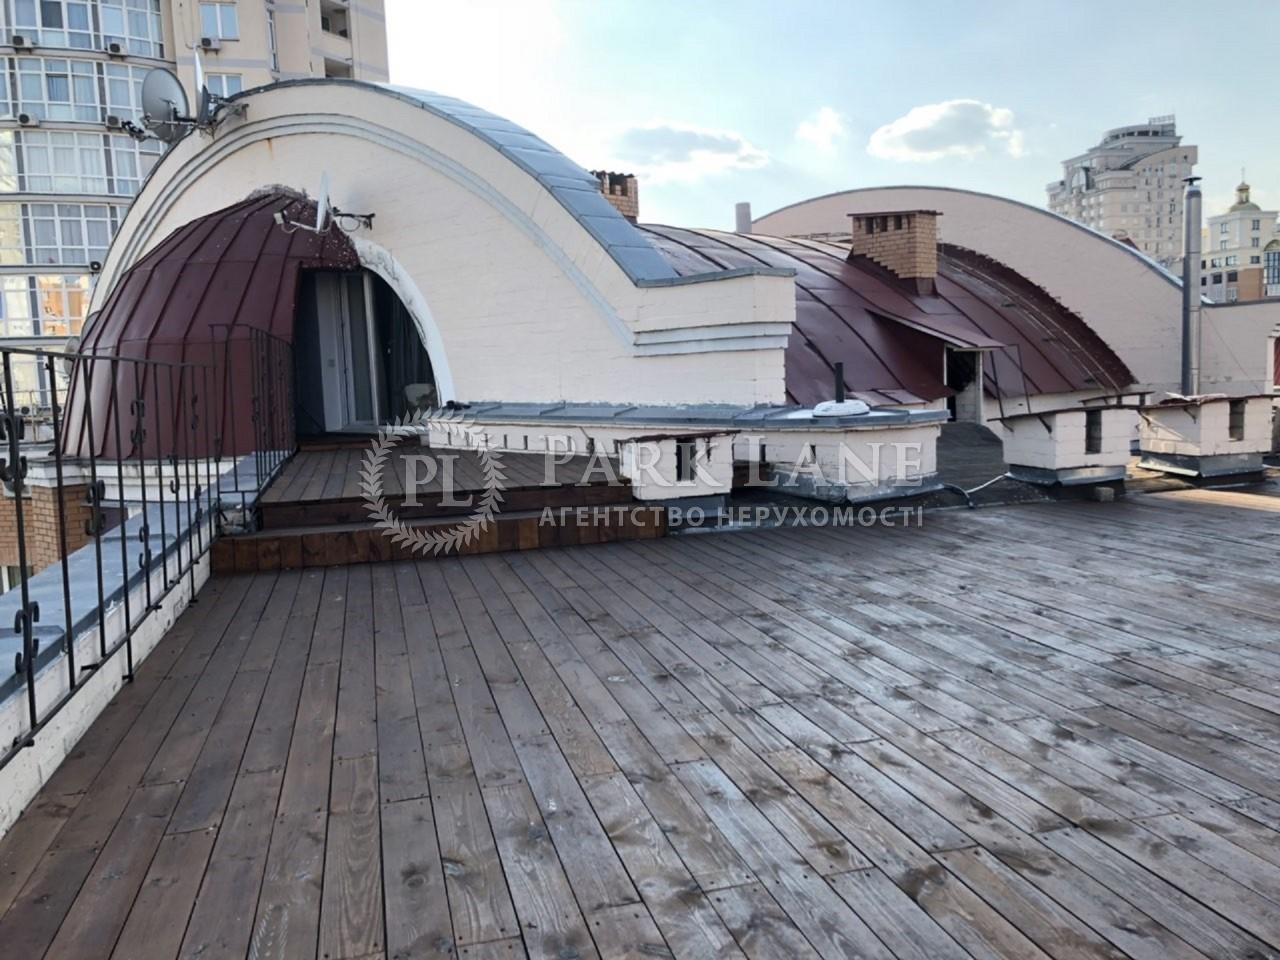 Квартира ул. Оболонская набережная, 3 корпус 3, Киев, R-26801 - Фото 13